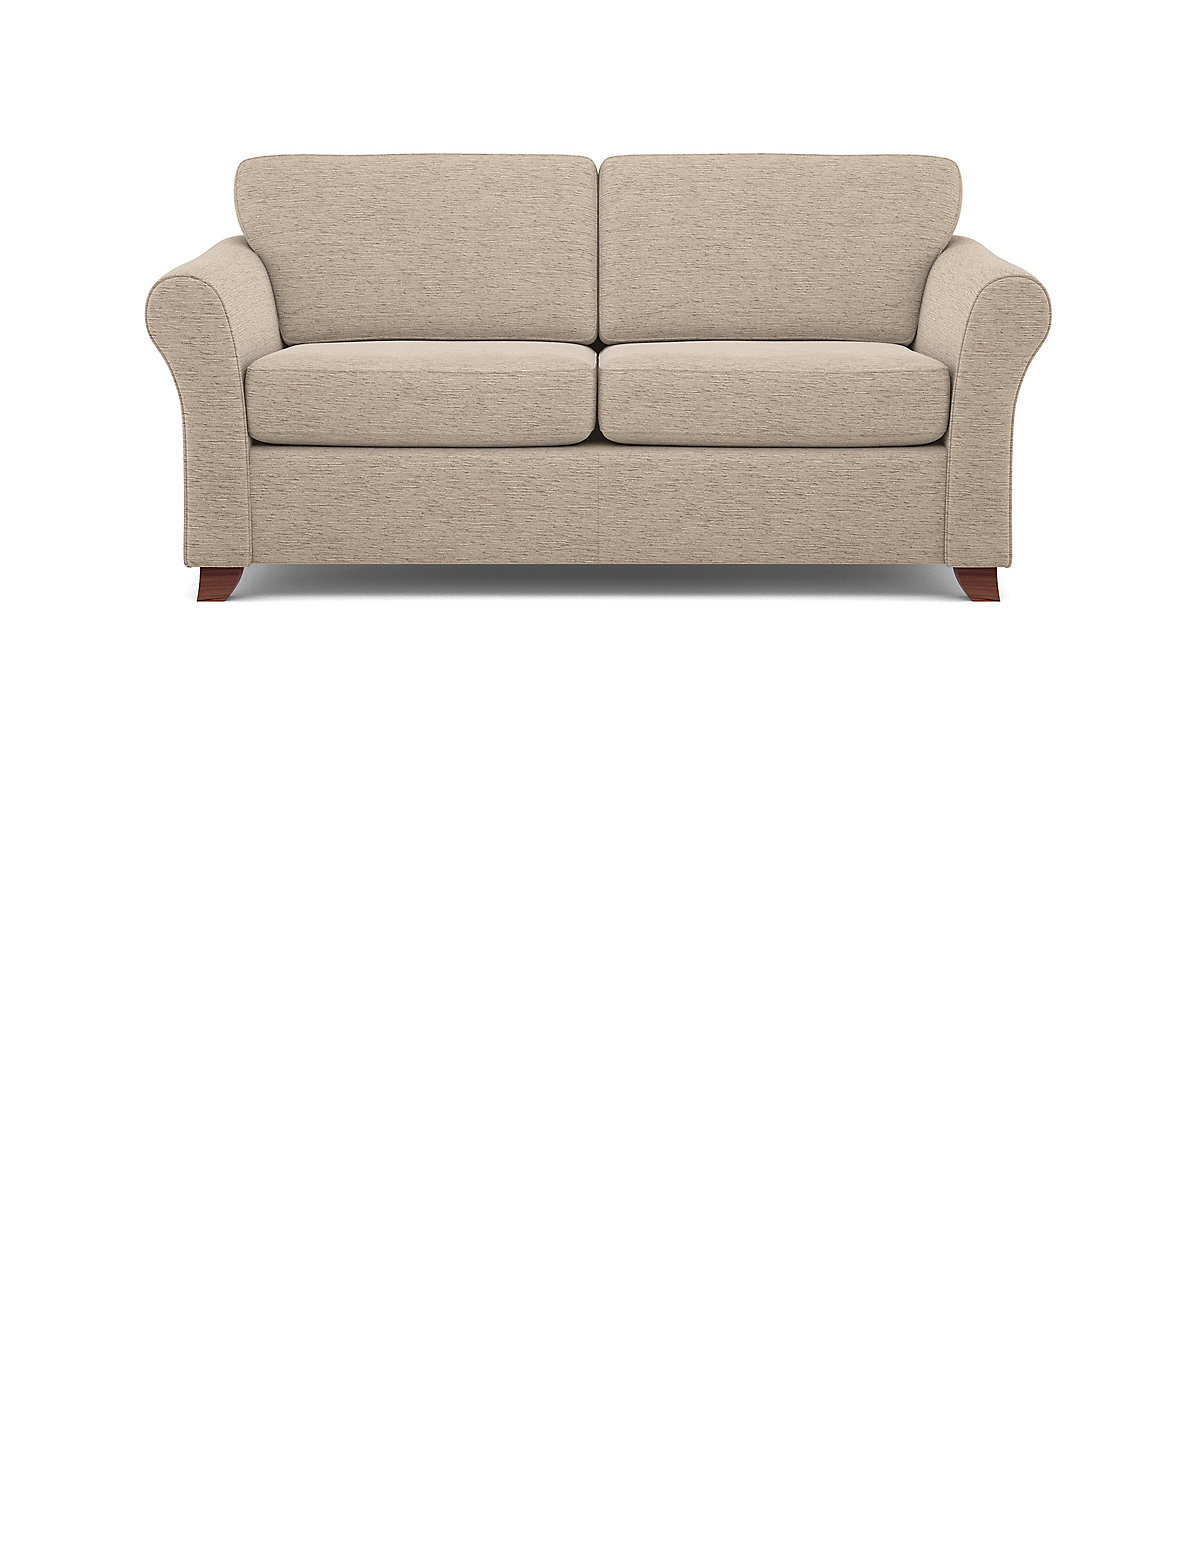 Image of Abbey Firm Medium Sofa